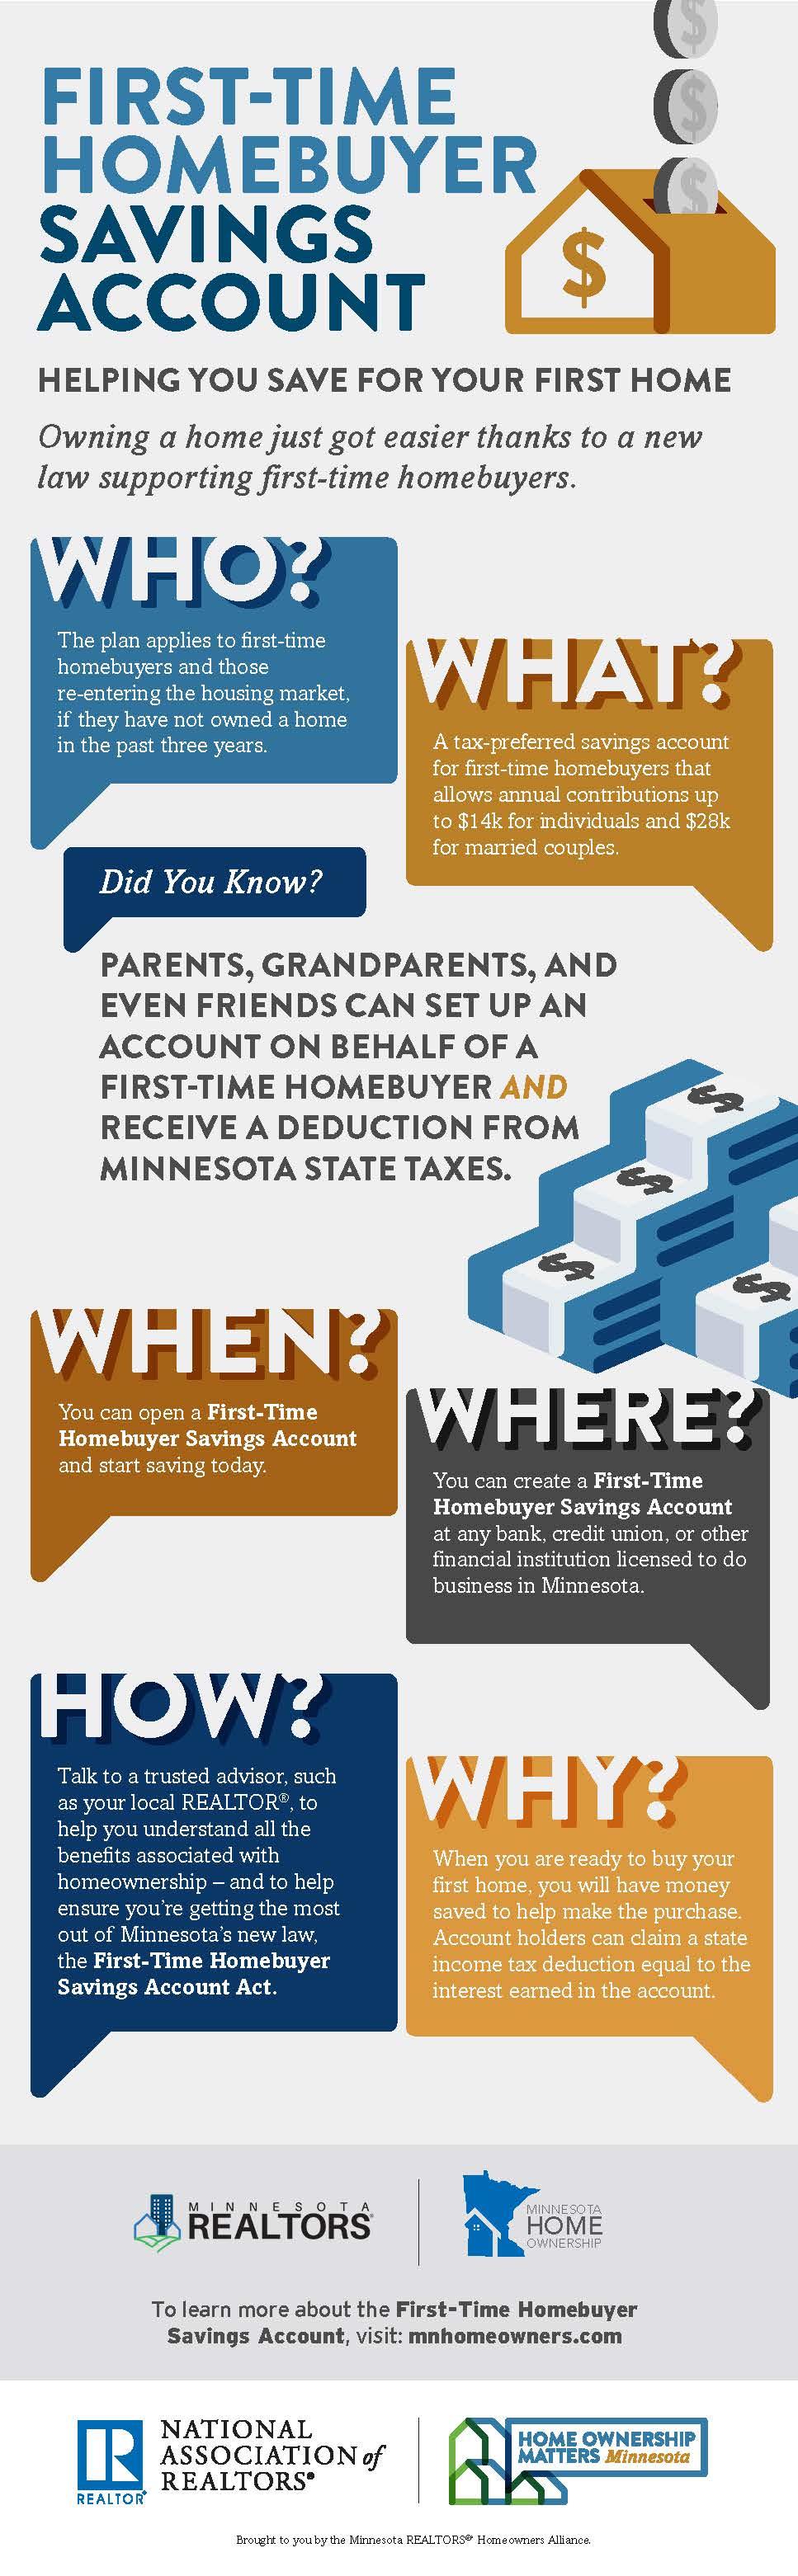 home loans wakota federal credit union. Black Bedroom Furniture Sets. Home Design Ideas